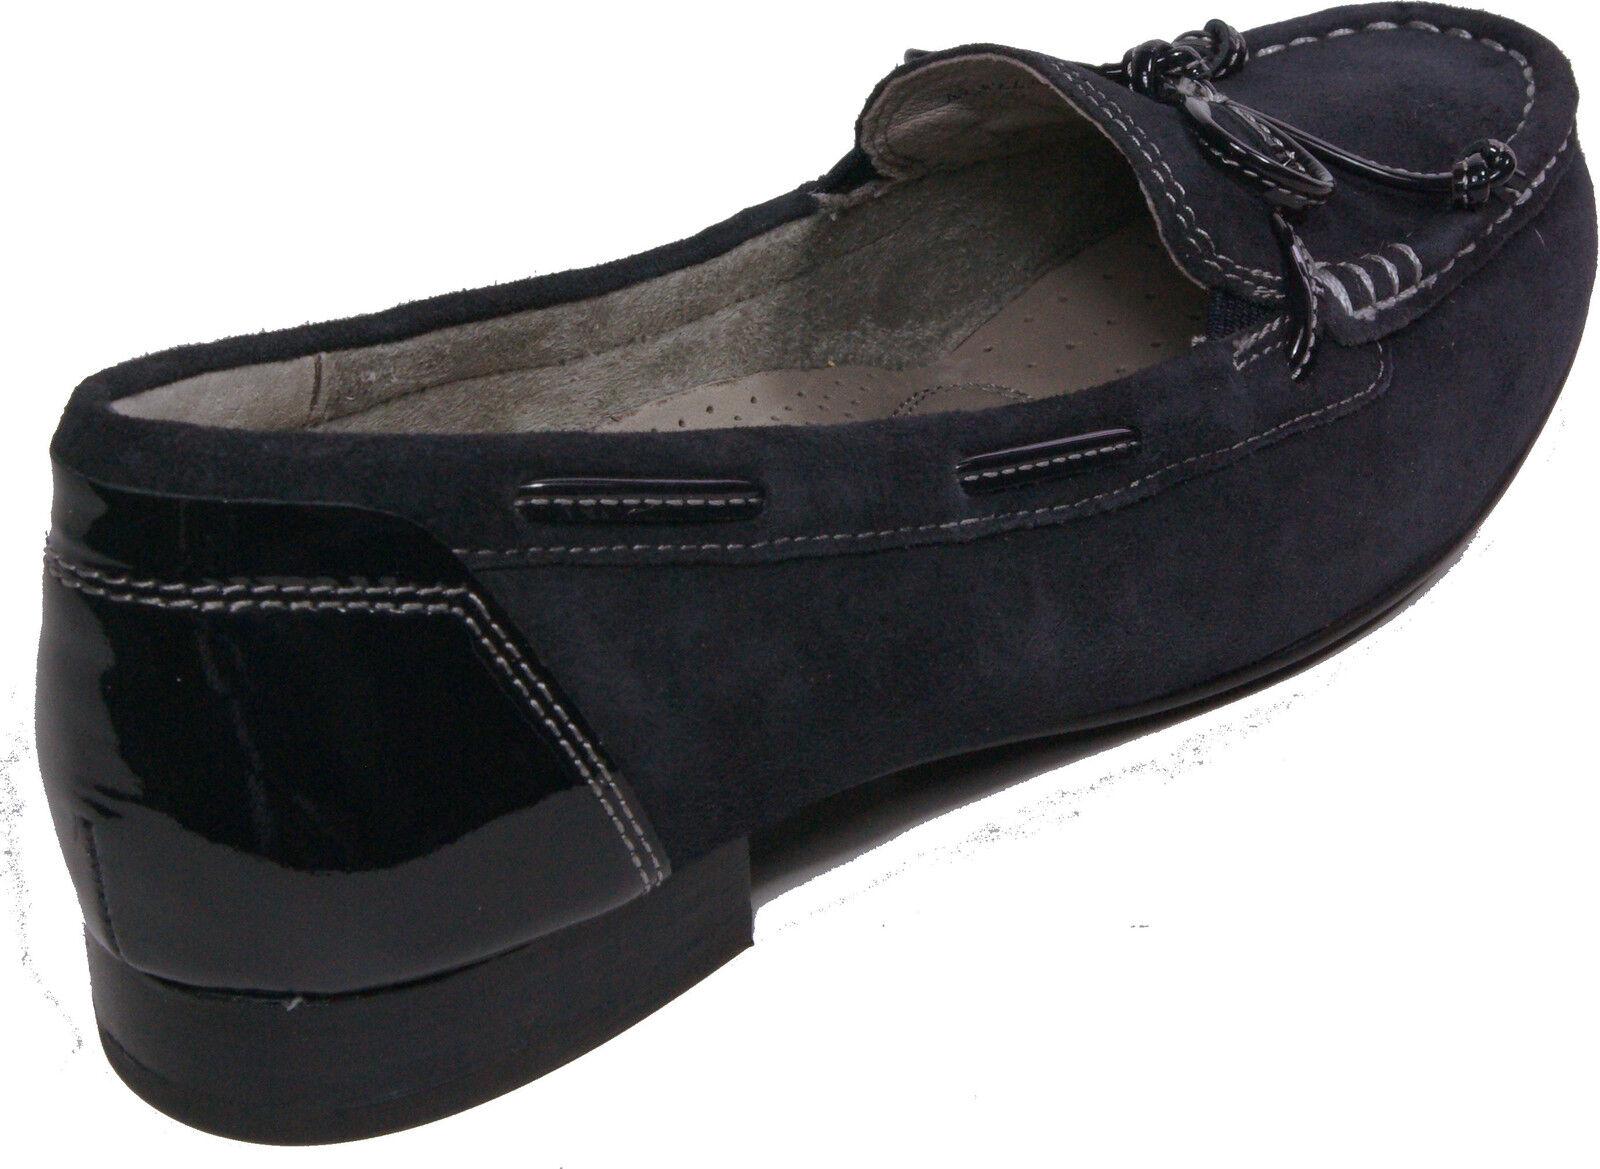 GABOR Schuhe Pumps Mokassin blau Weite echt Leder Nubuk Lack Weite blau G NEU a8dabc